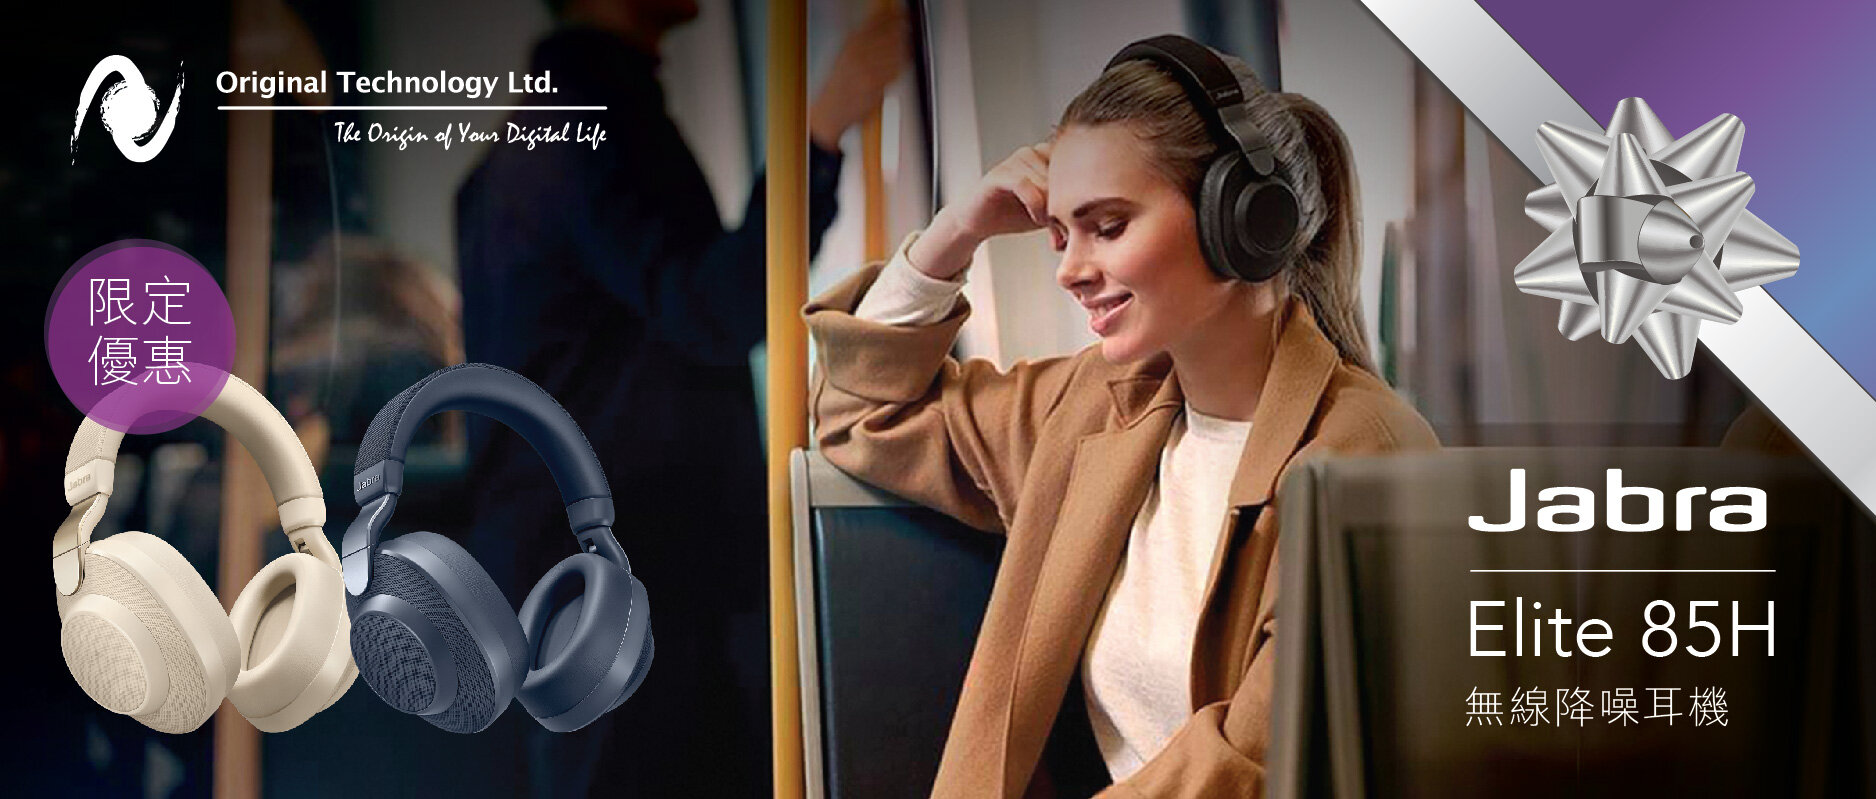 Jabra Elite 85h 限定優惠|Limited Offer